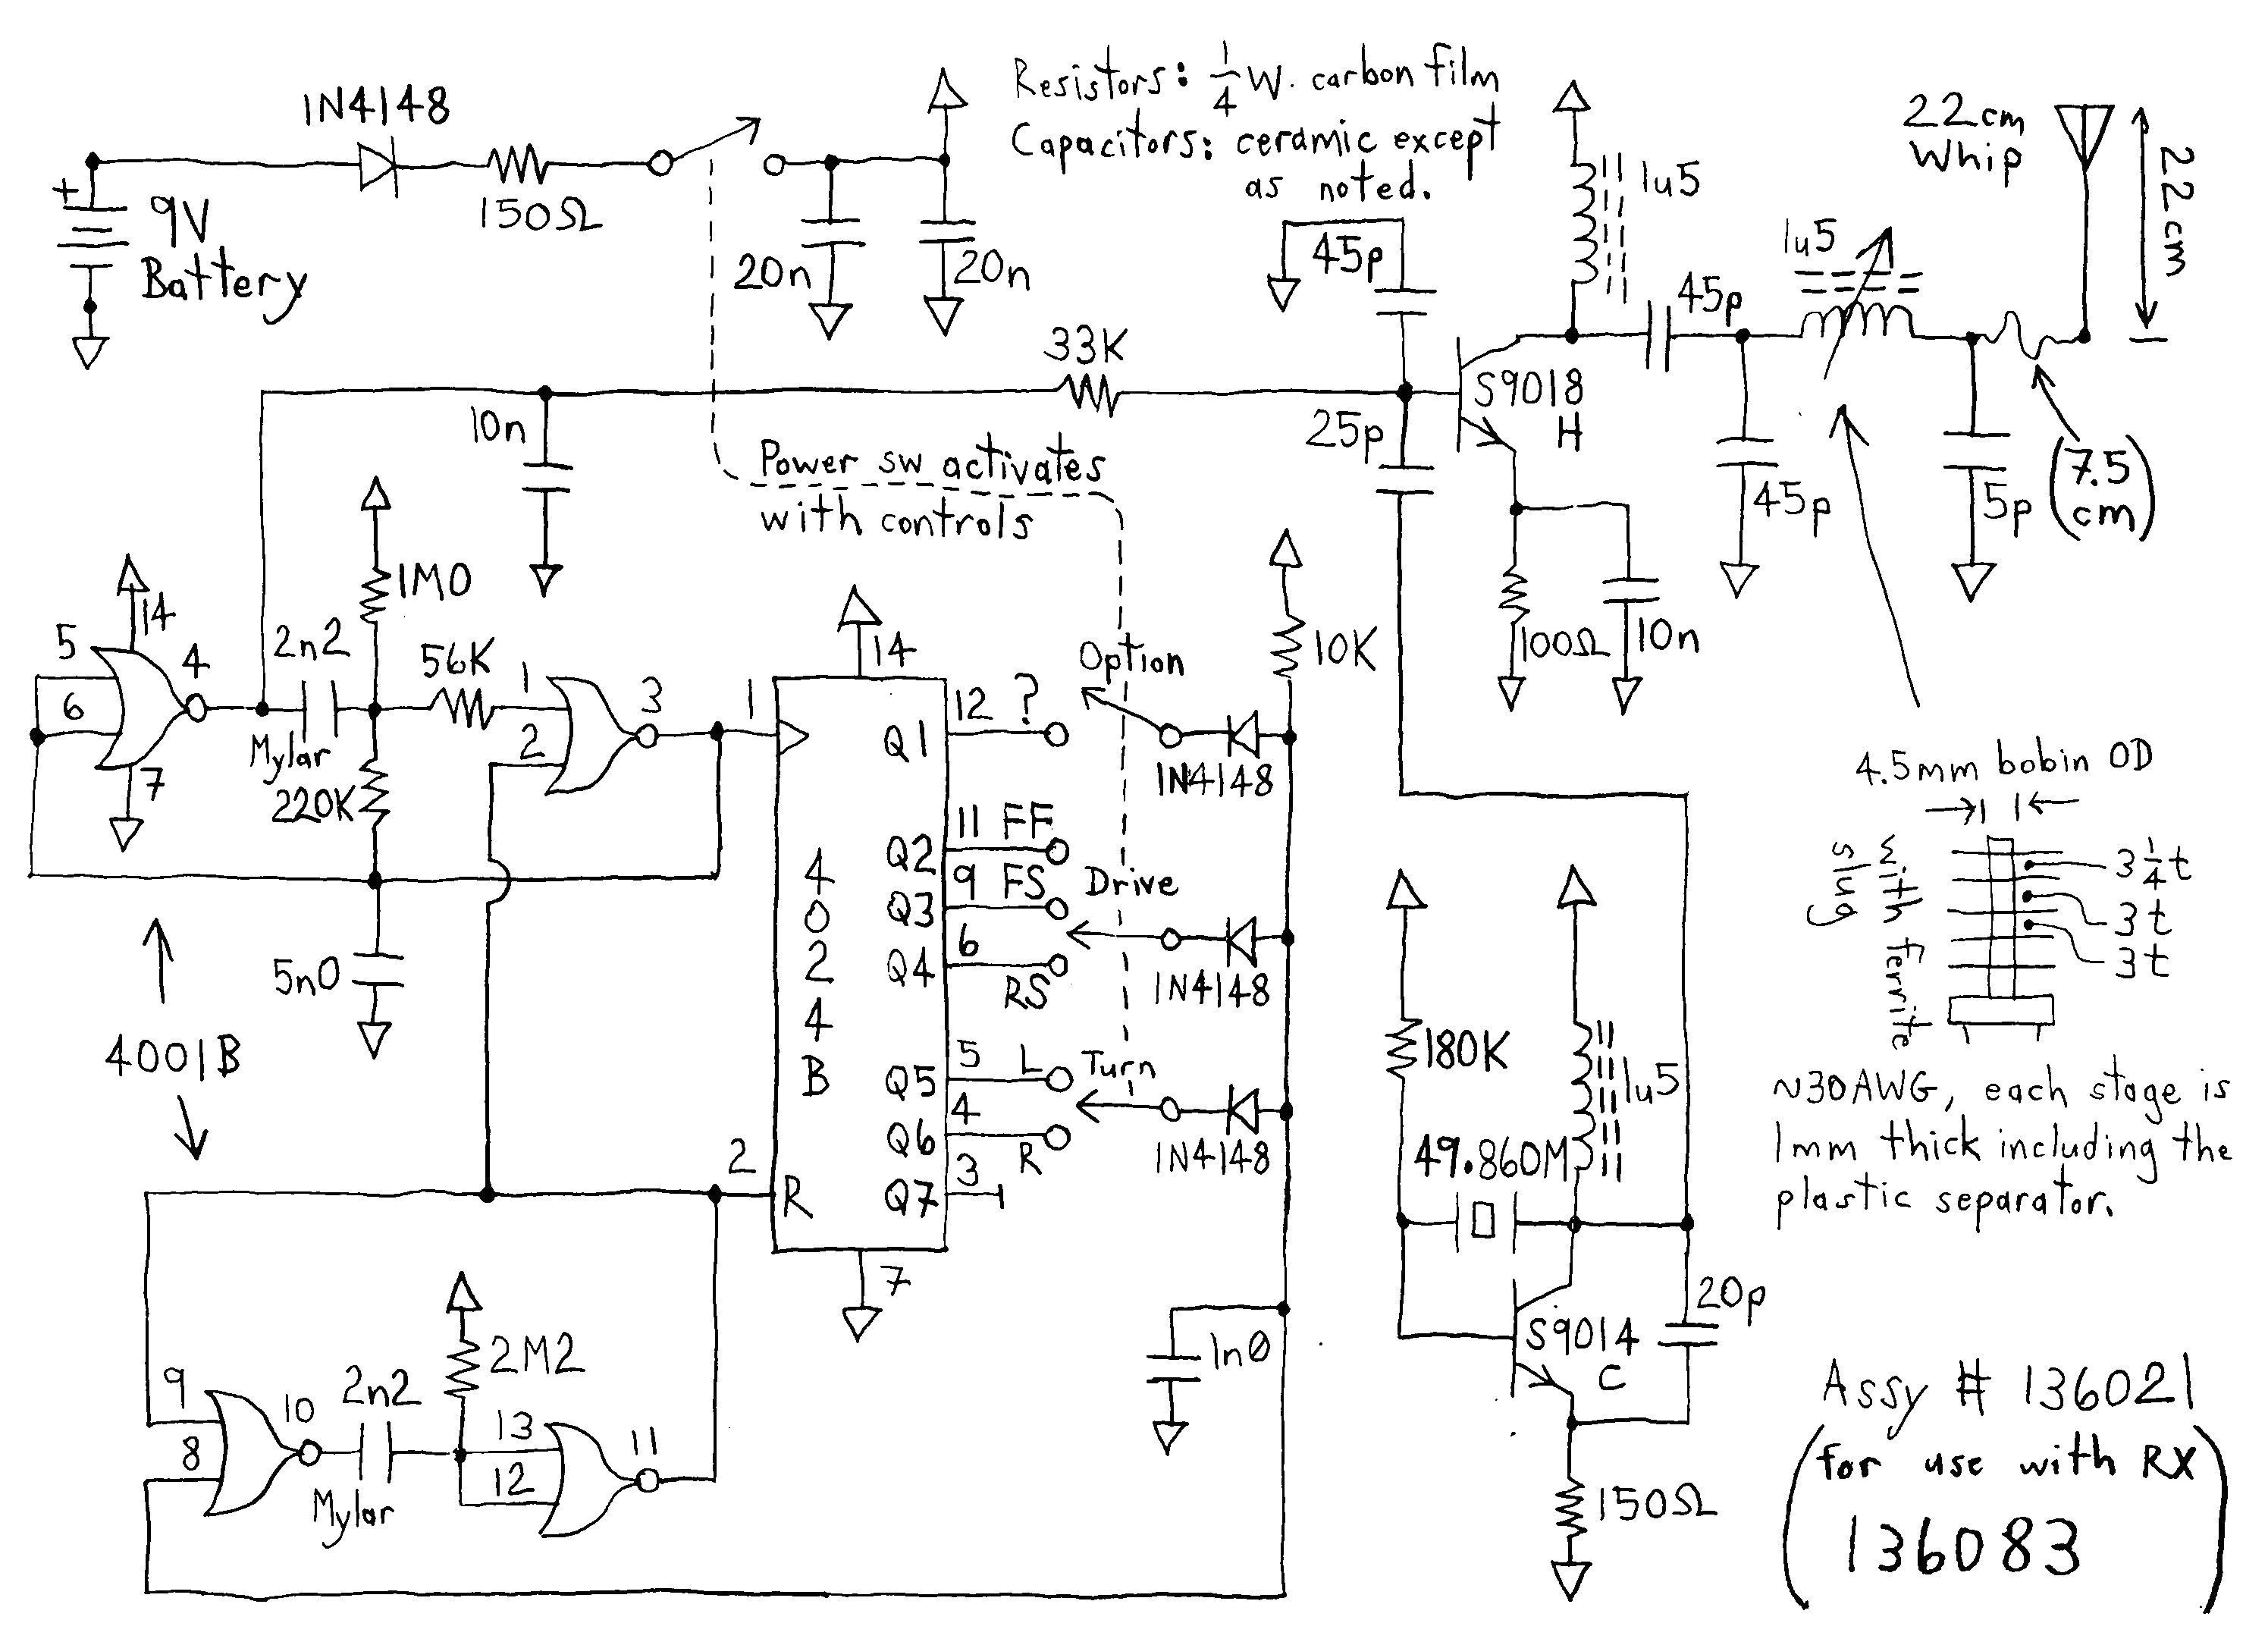 2000 dodge ram 1500 ignition coil fresh 2000 dodge stratus power distribution diagram dodge wiring of 2000 dodge ram 1500 ignition coil jpg